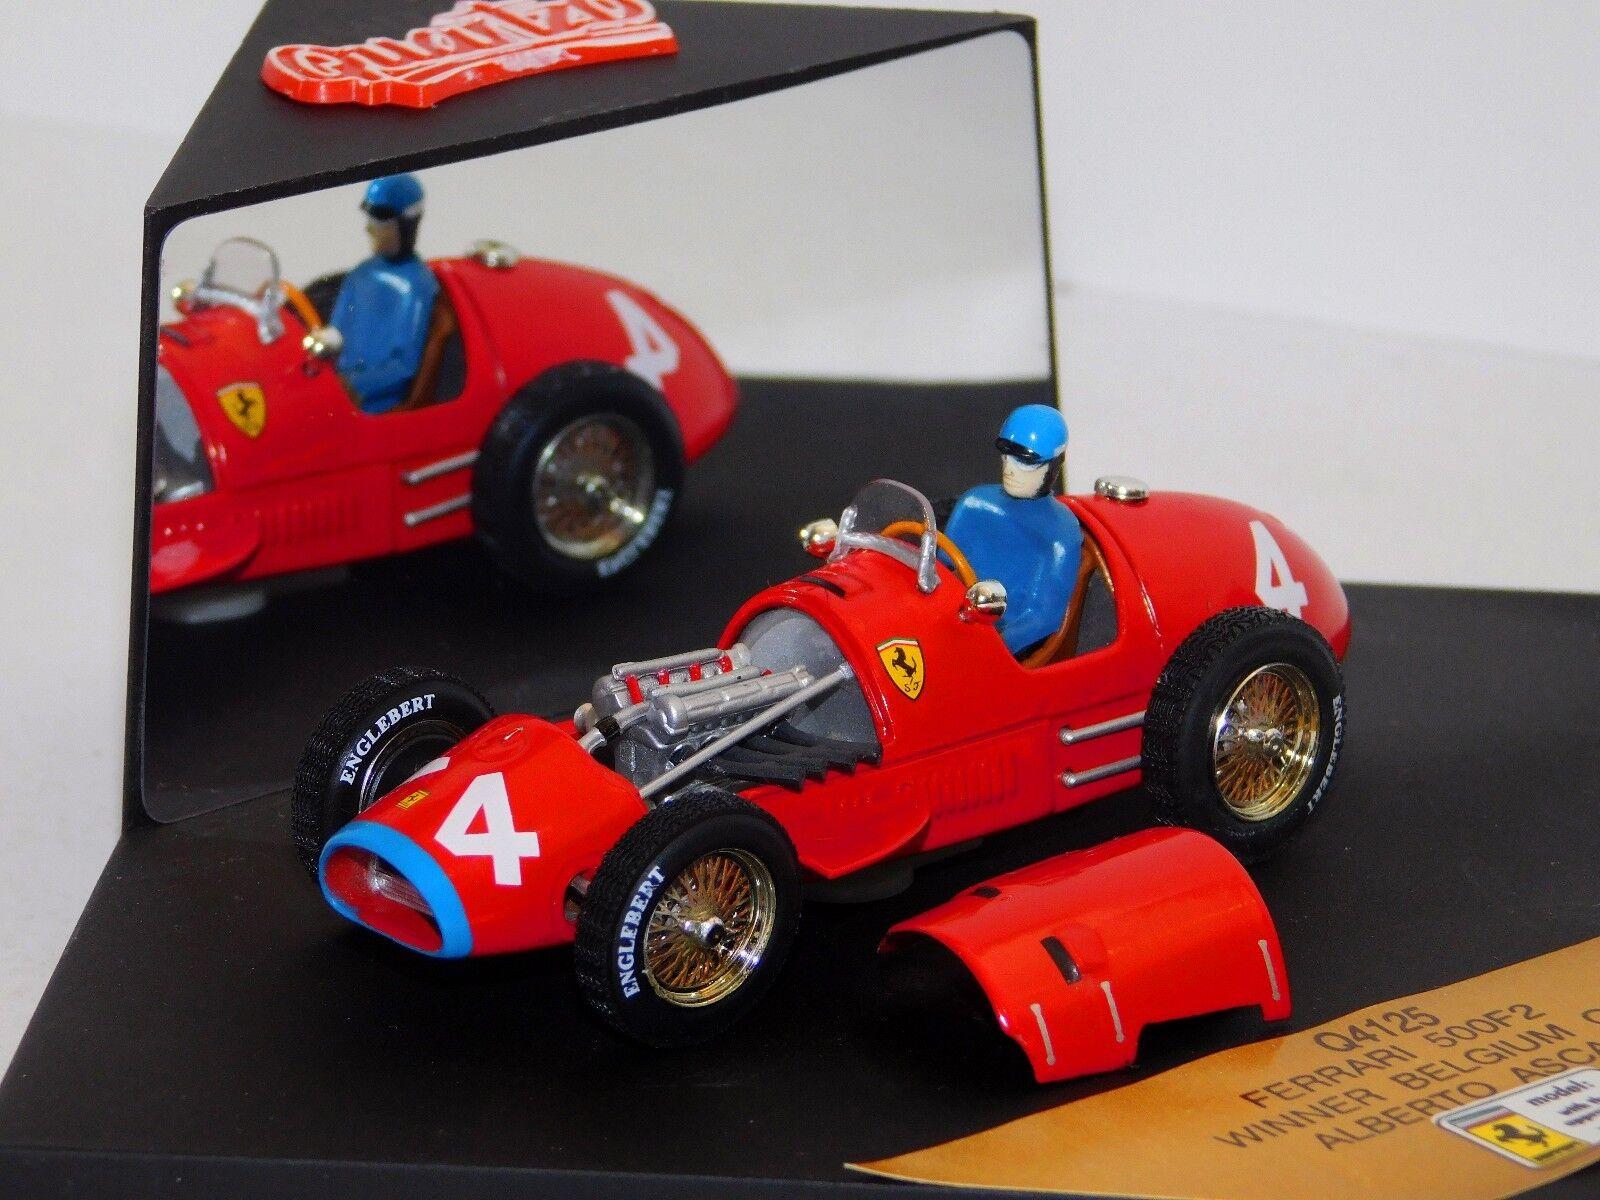 FERRARI 500F2 A. ASCARI WINNER BELGIUM GP 1952 QUARTZO Q4125 1 43